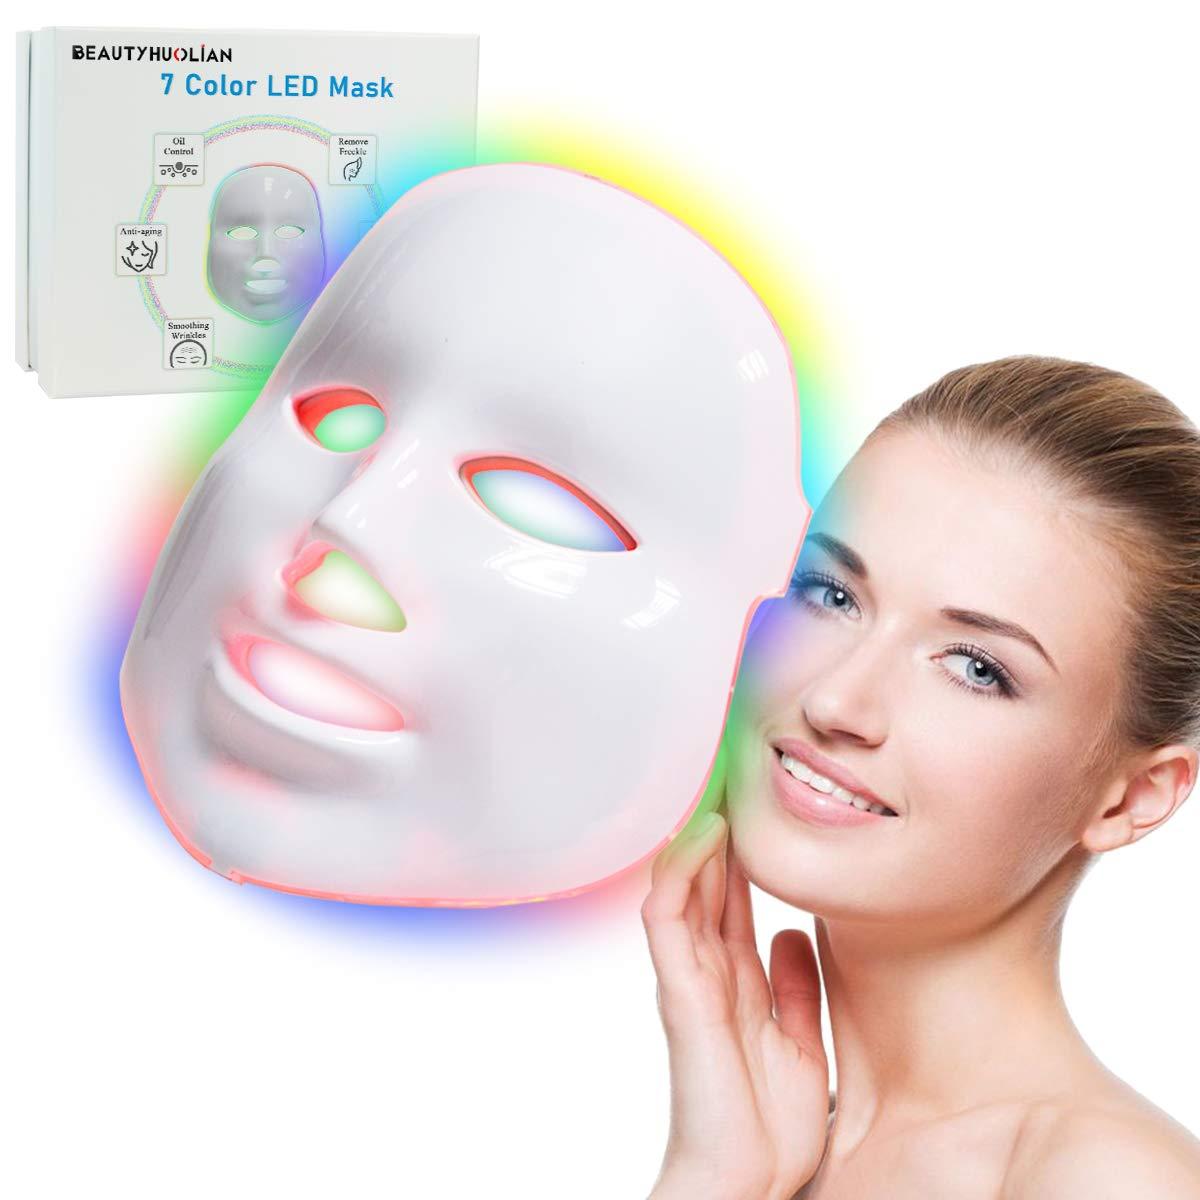 BeautyHuoLian Therapy Rejuvenation Photon Portable